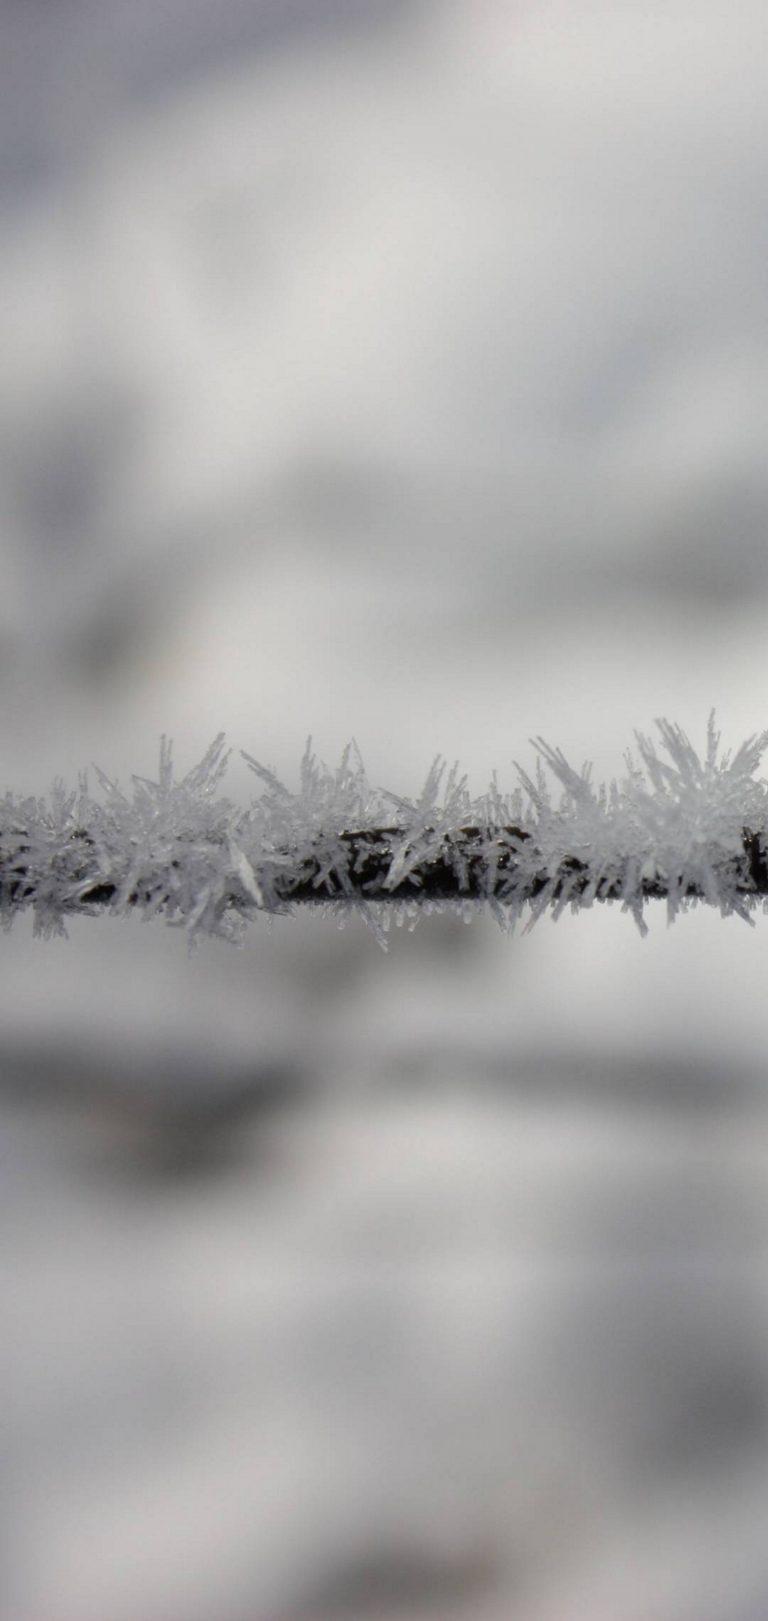 Winter Frozen Snow Wallpaper 1440x3040 768x1621